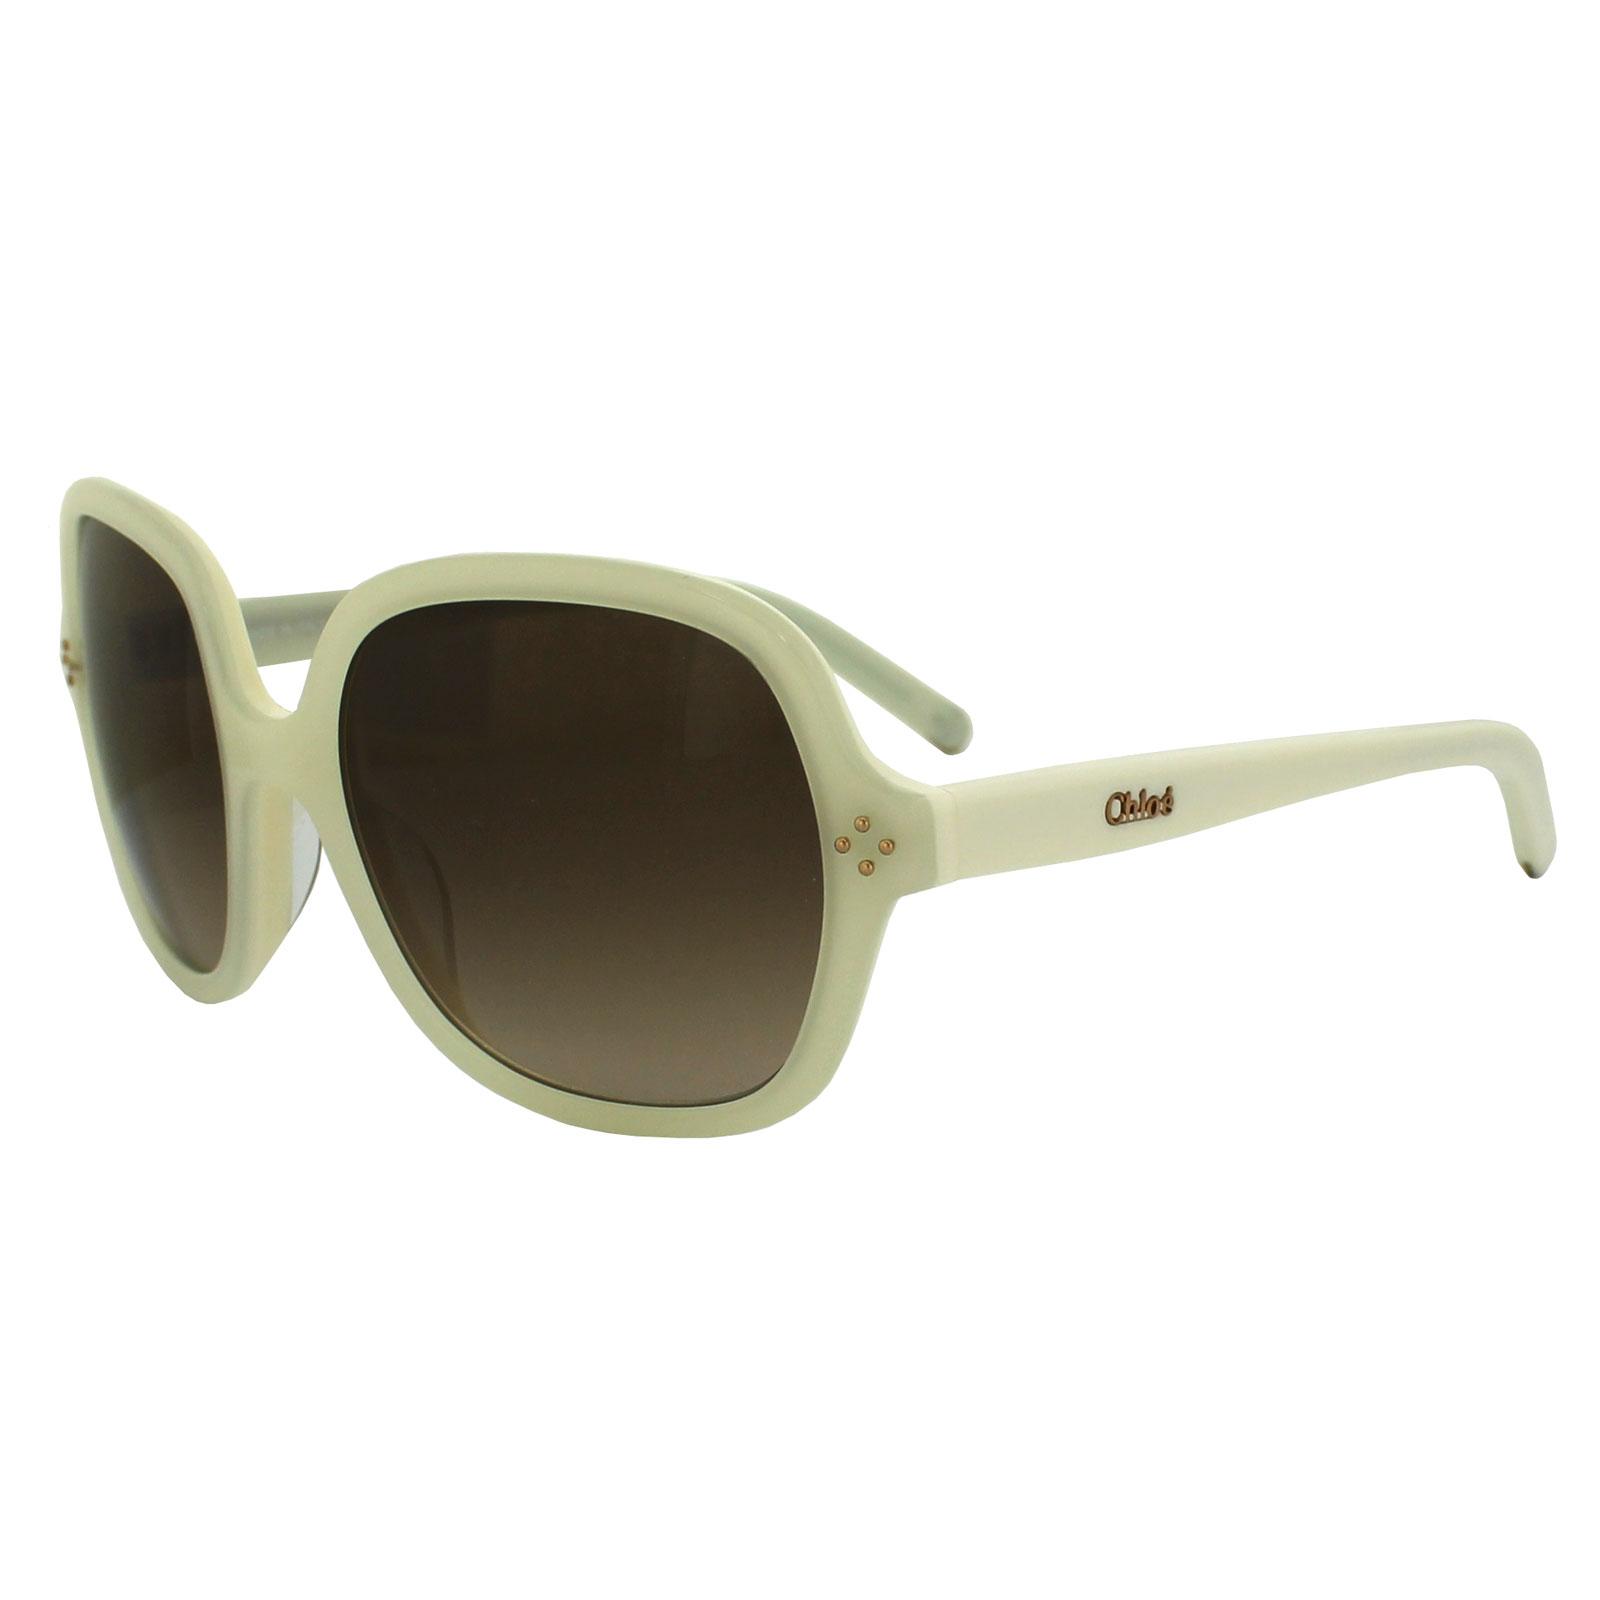 0617fc0d151c Chloe Sunglasses Ebay